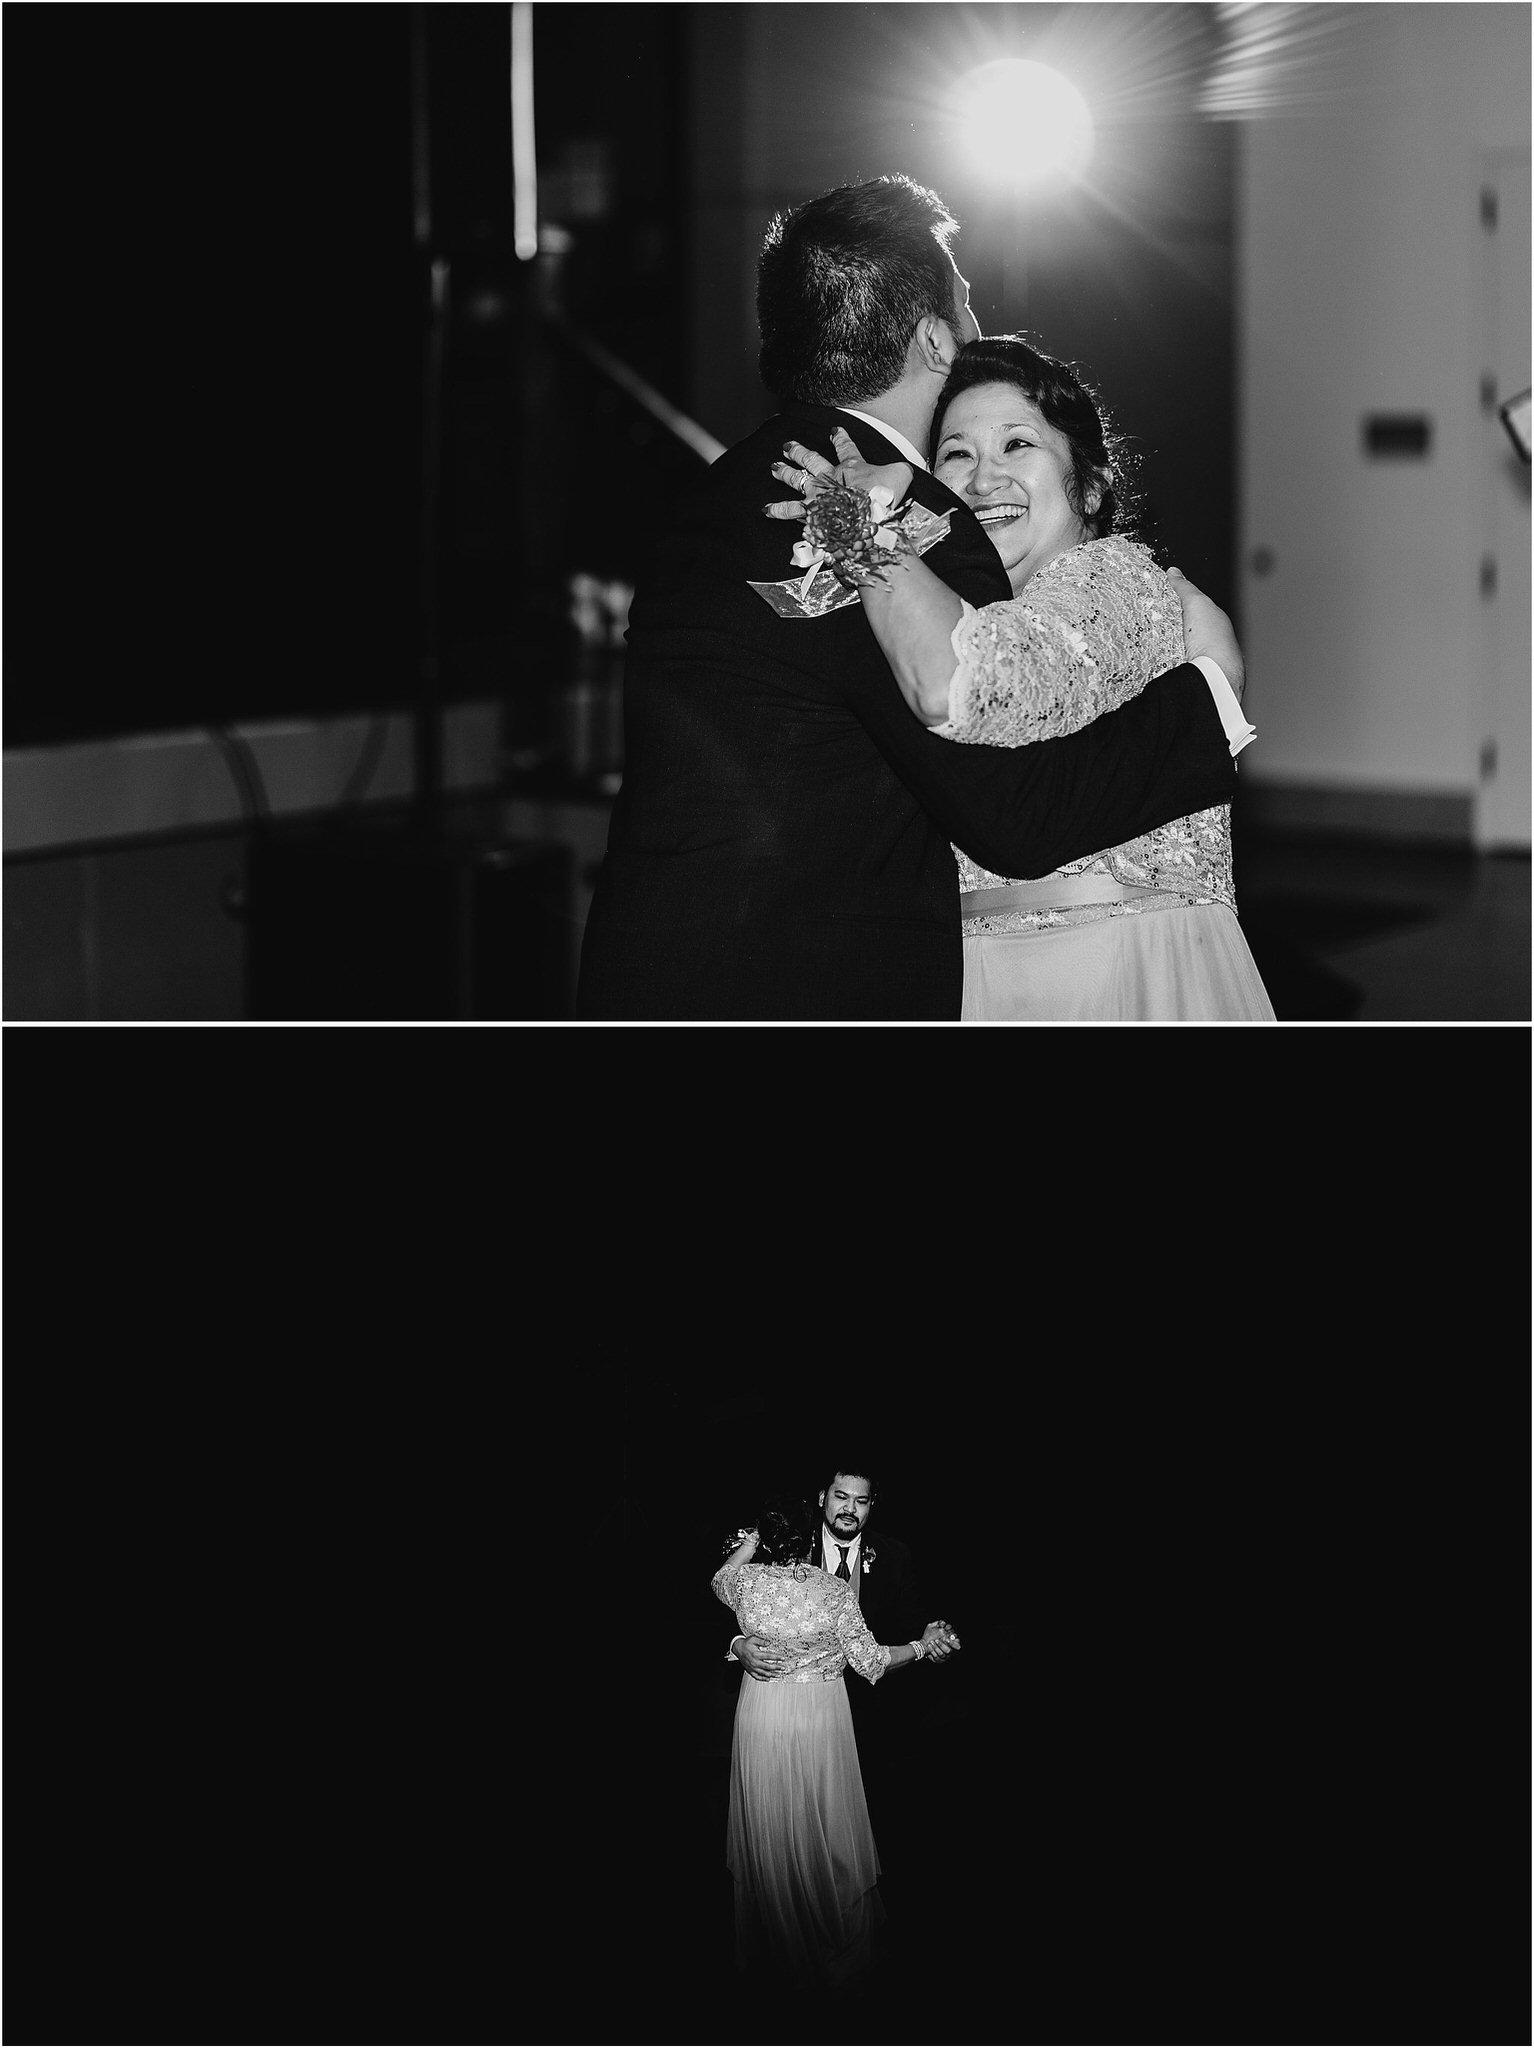 katy-robin-married-in-mukilteo-wedding47.jpg